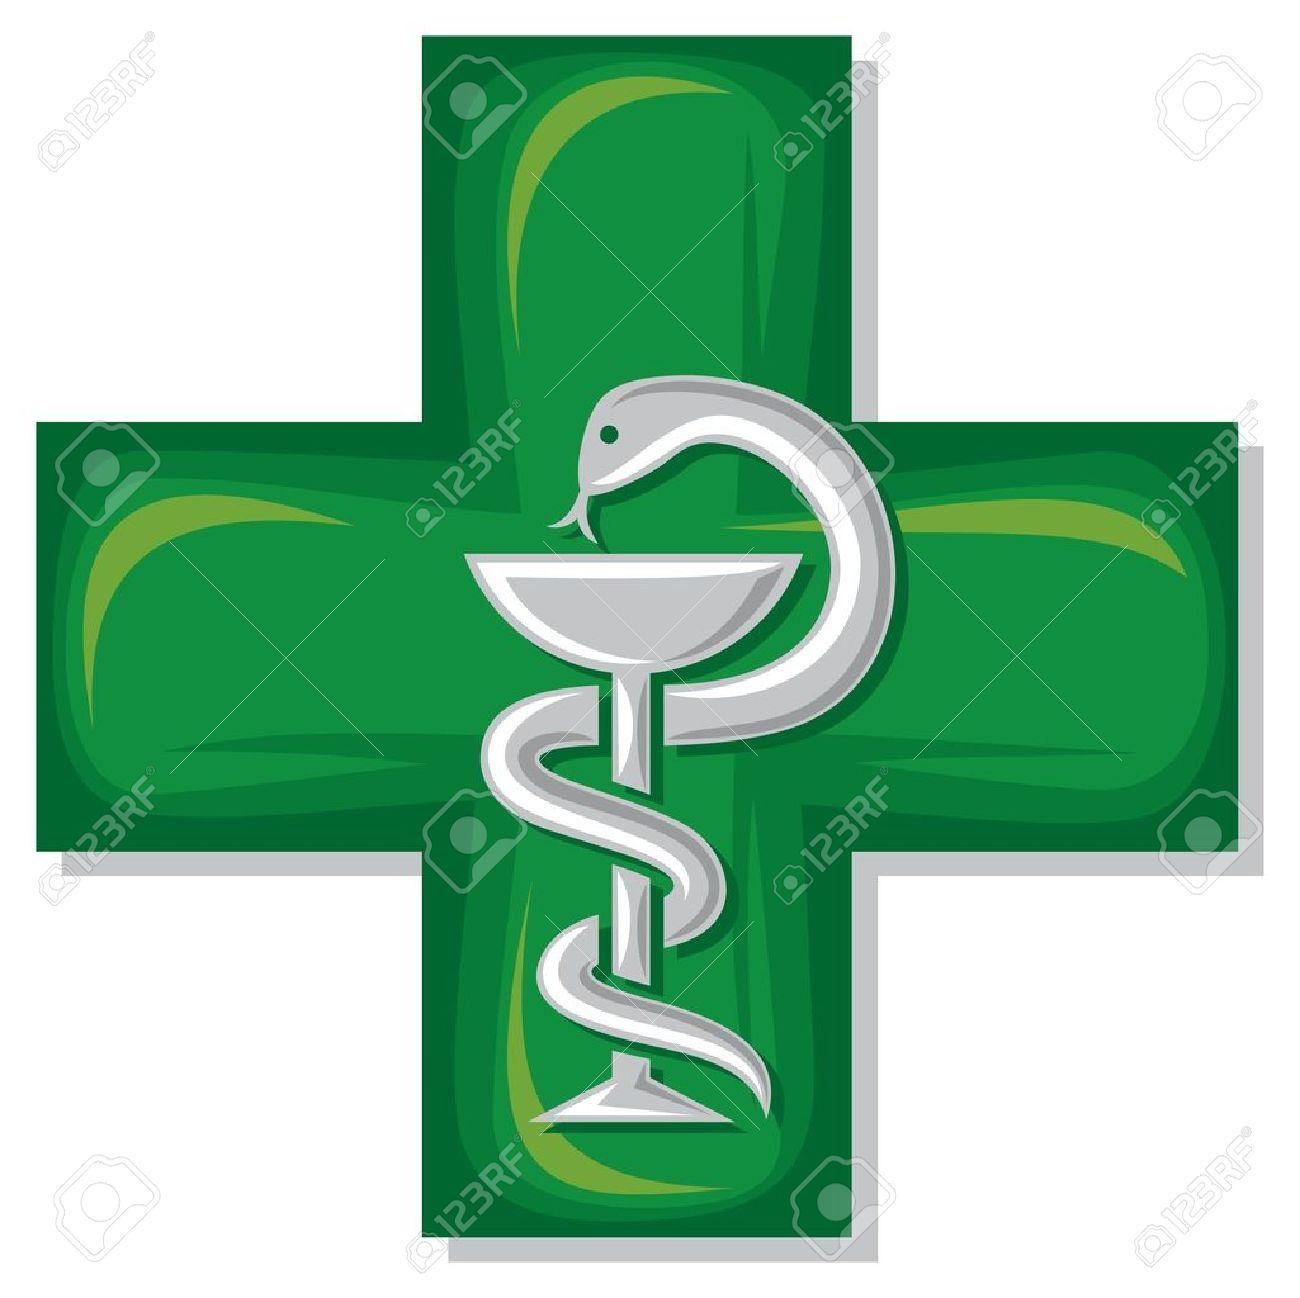 Змея символ медицины картинки 4